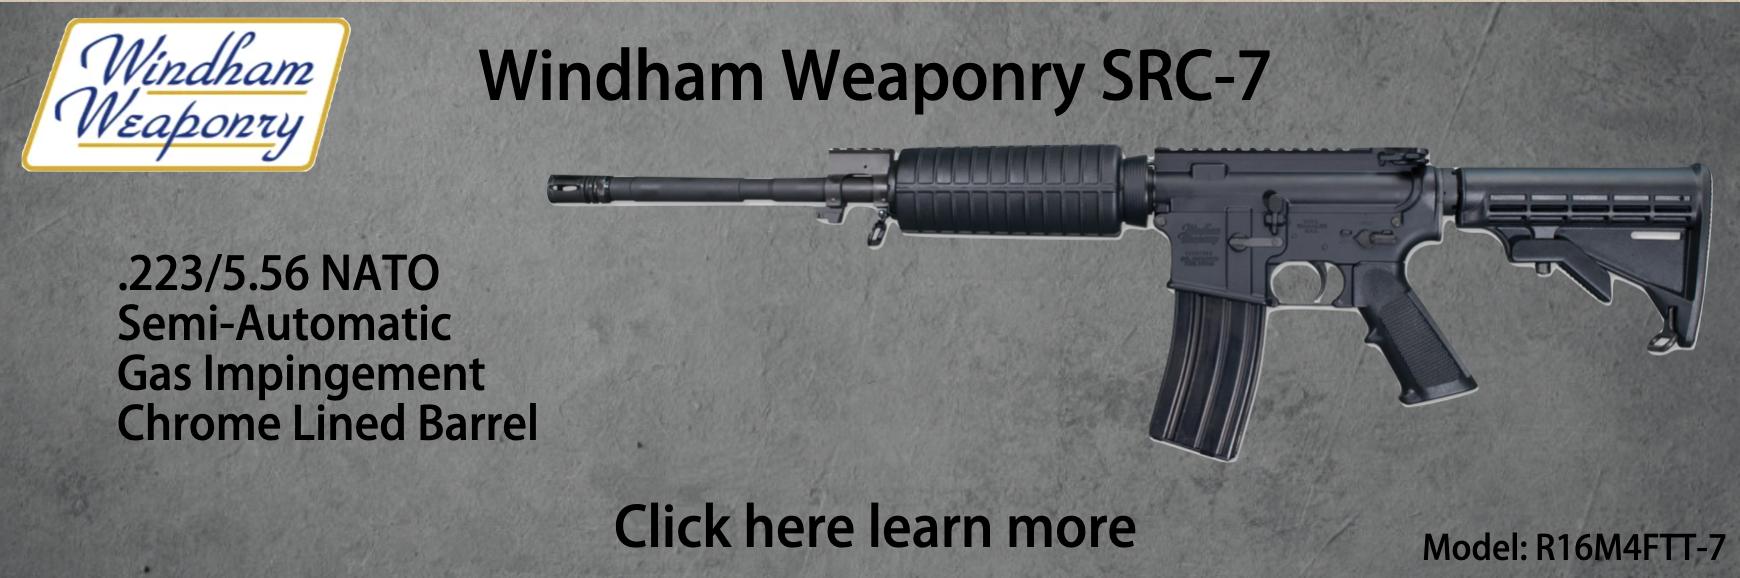 https://www.thegunmanshow.com/products/windham-weaponry-r16m4ftt-7-4239